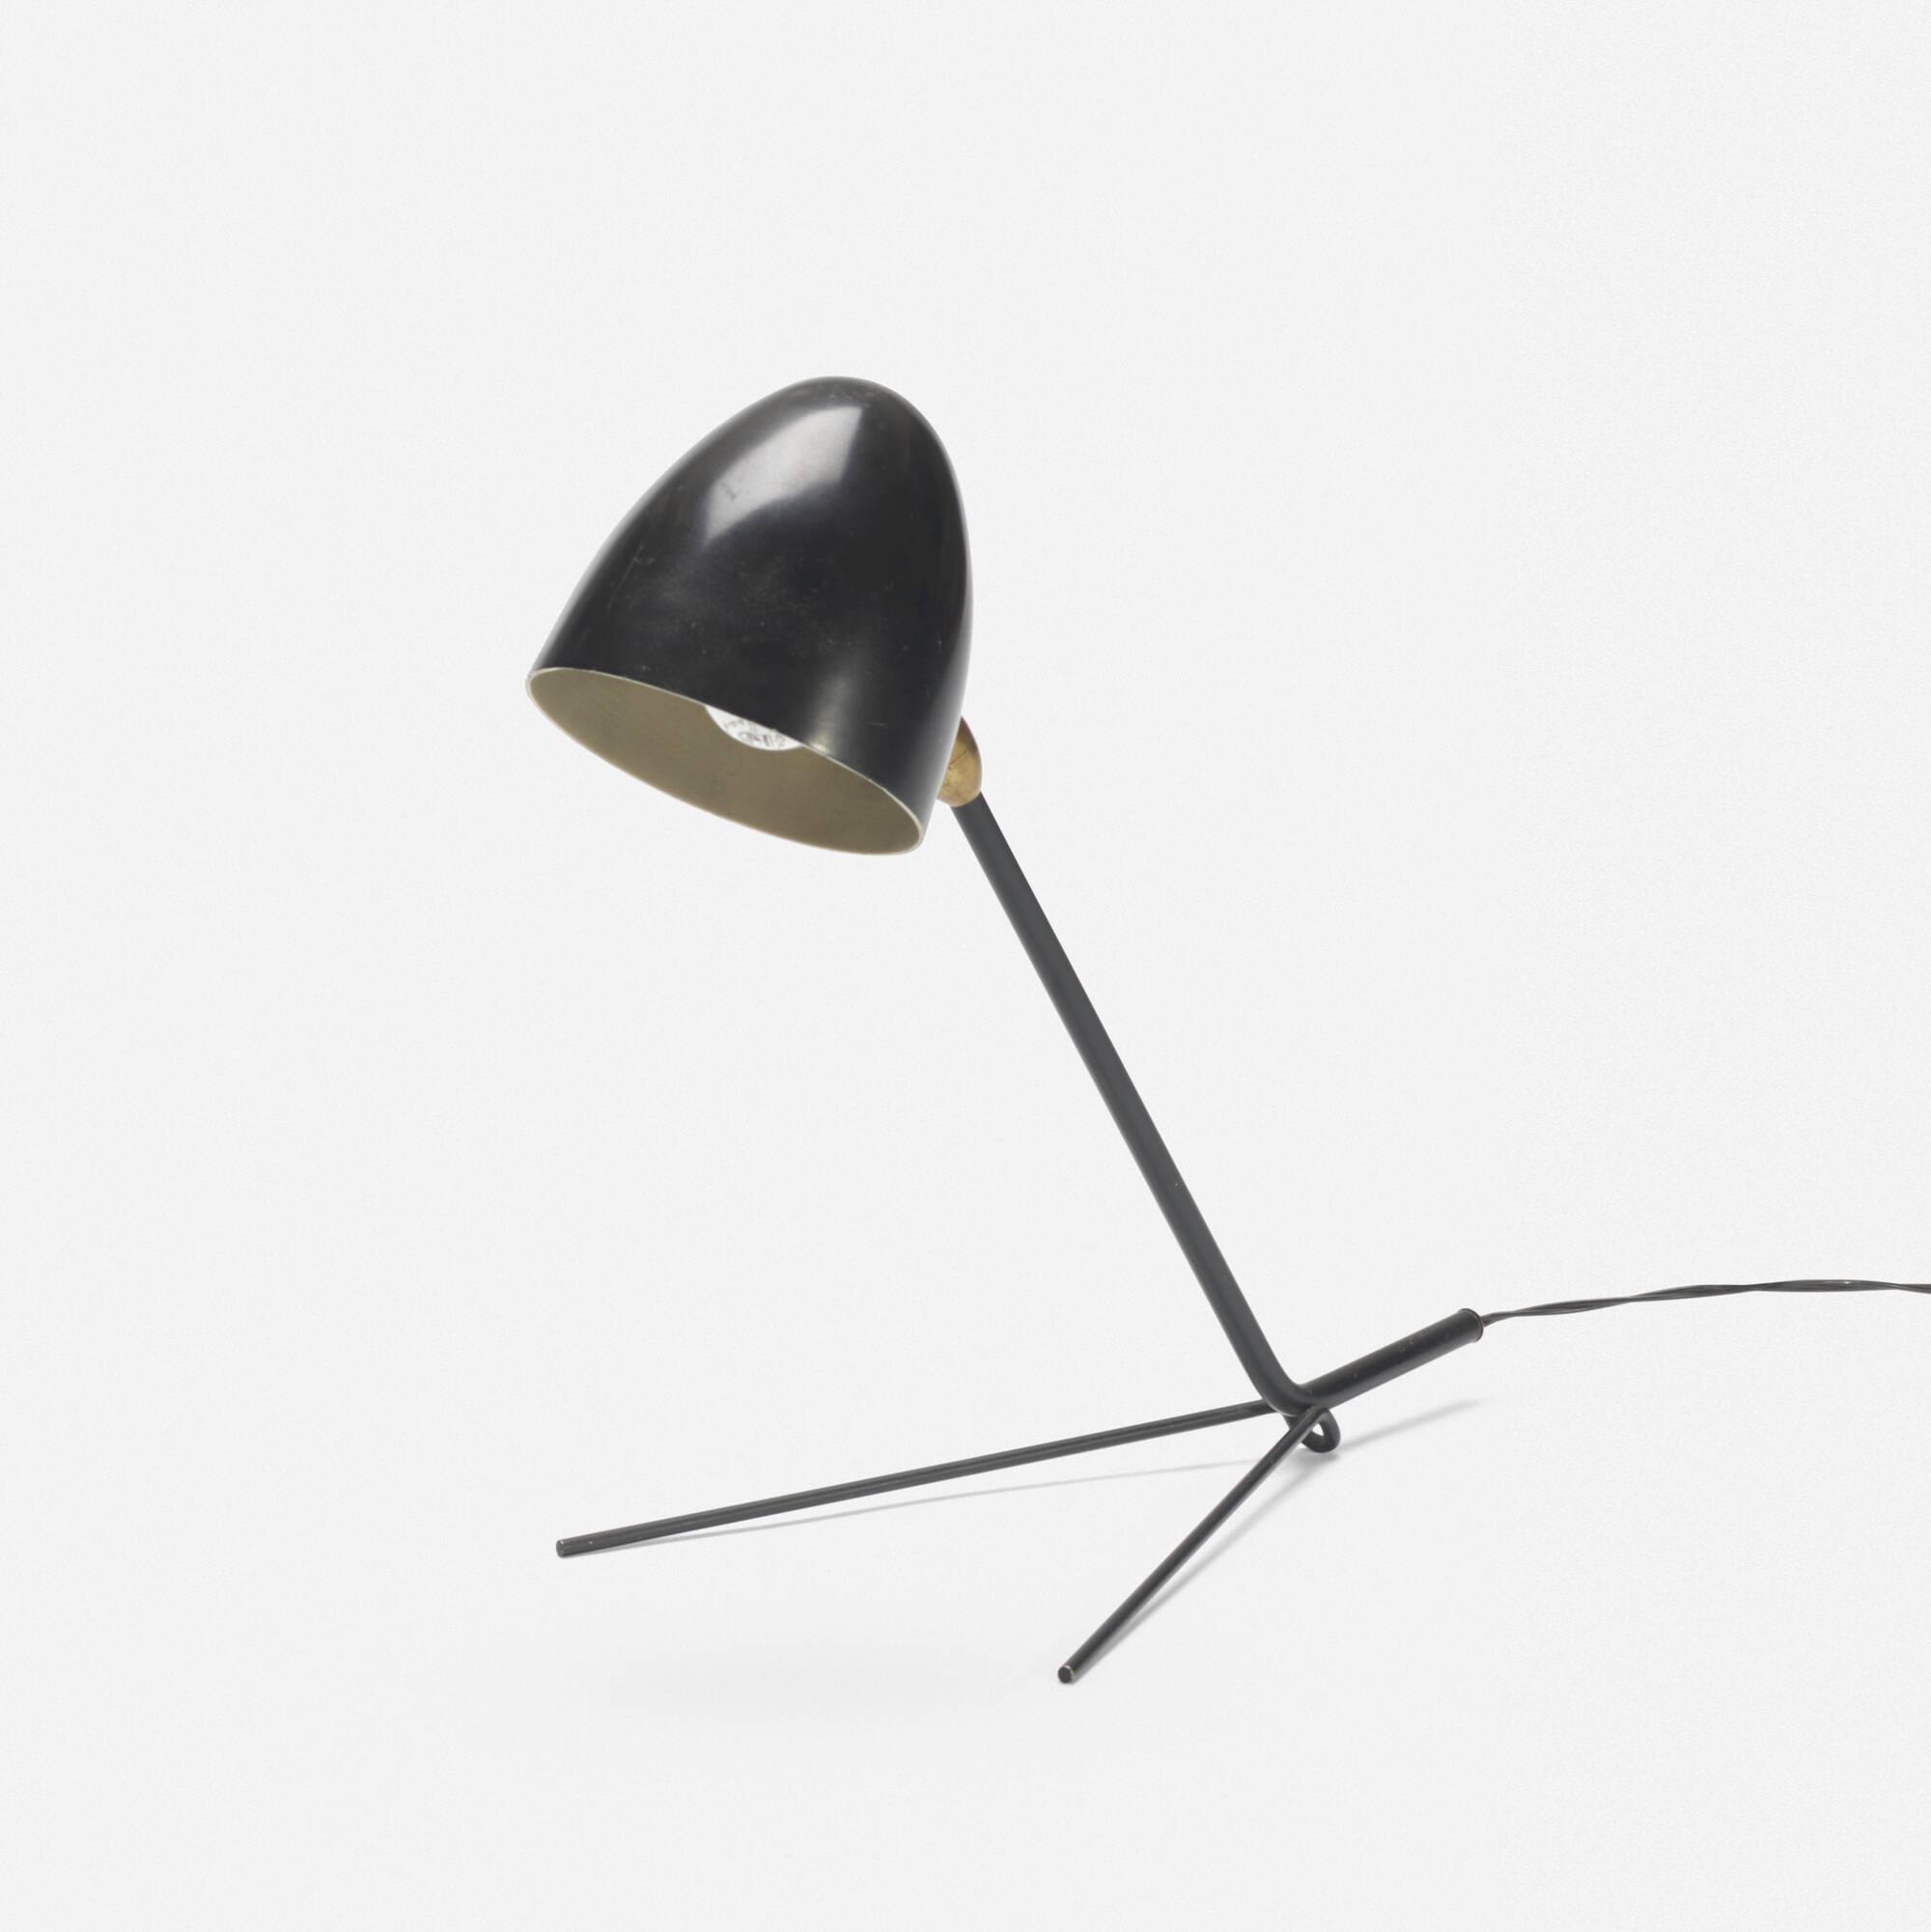 144 serge mouille cocotte table lamp design 23 march 2017 144 serge mouille cocotte table lamp 1 of 2 arubaitofo Images